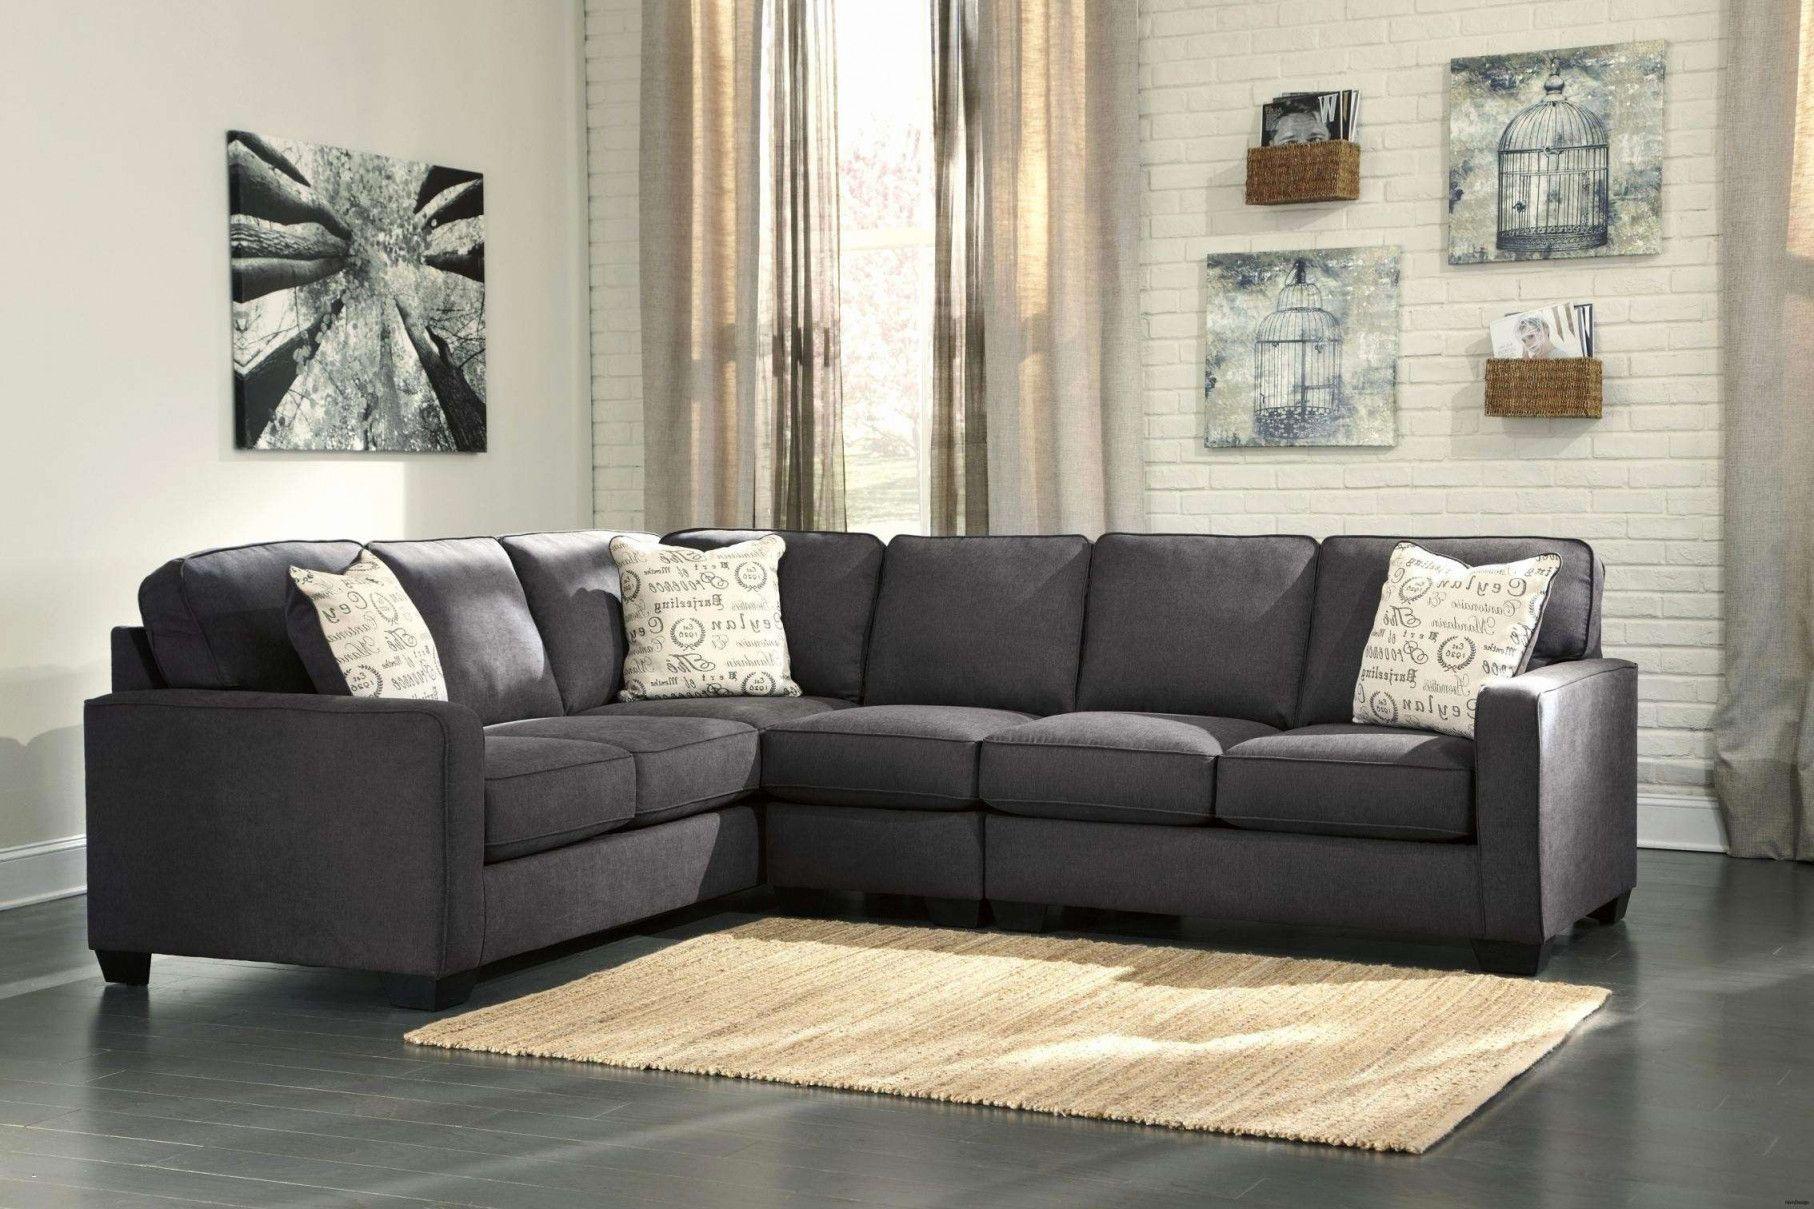 30++ Sofa mitten im raum ideen